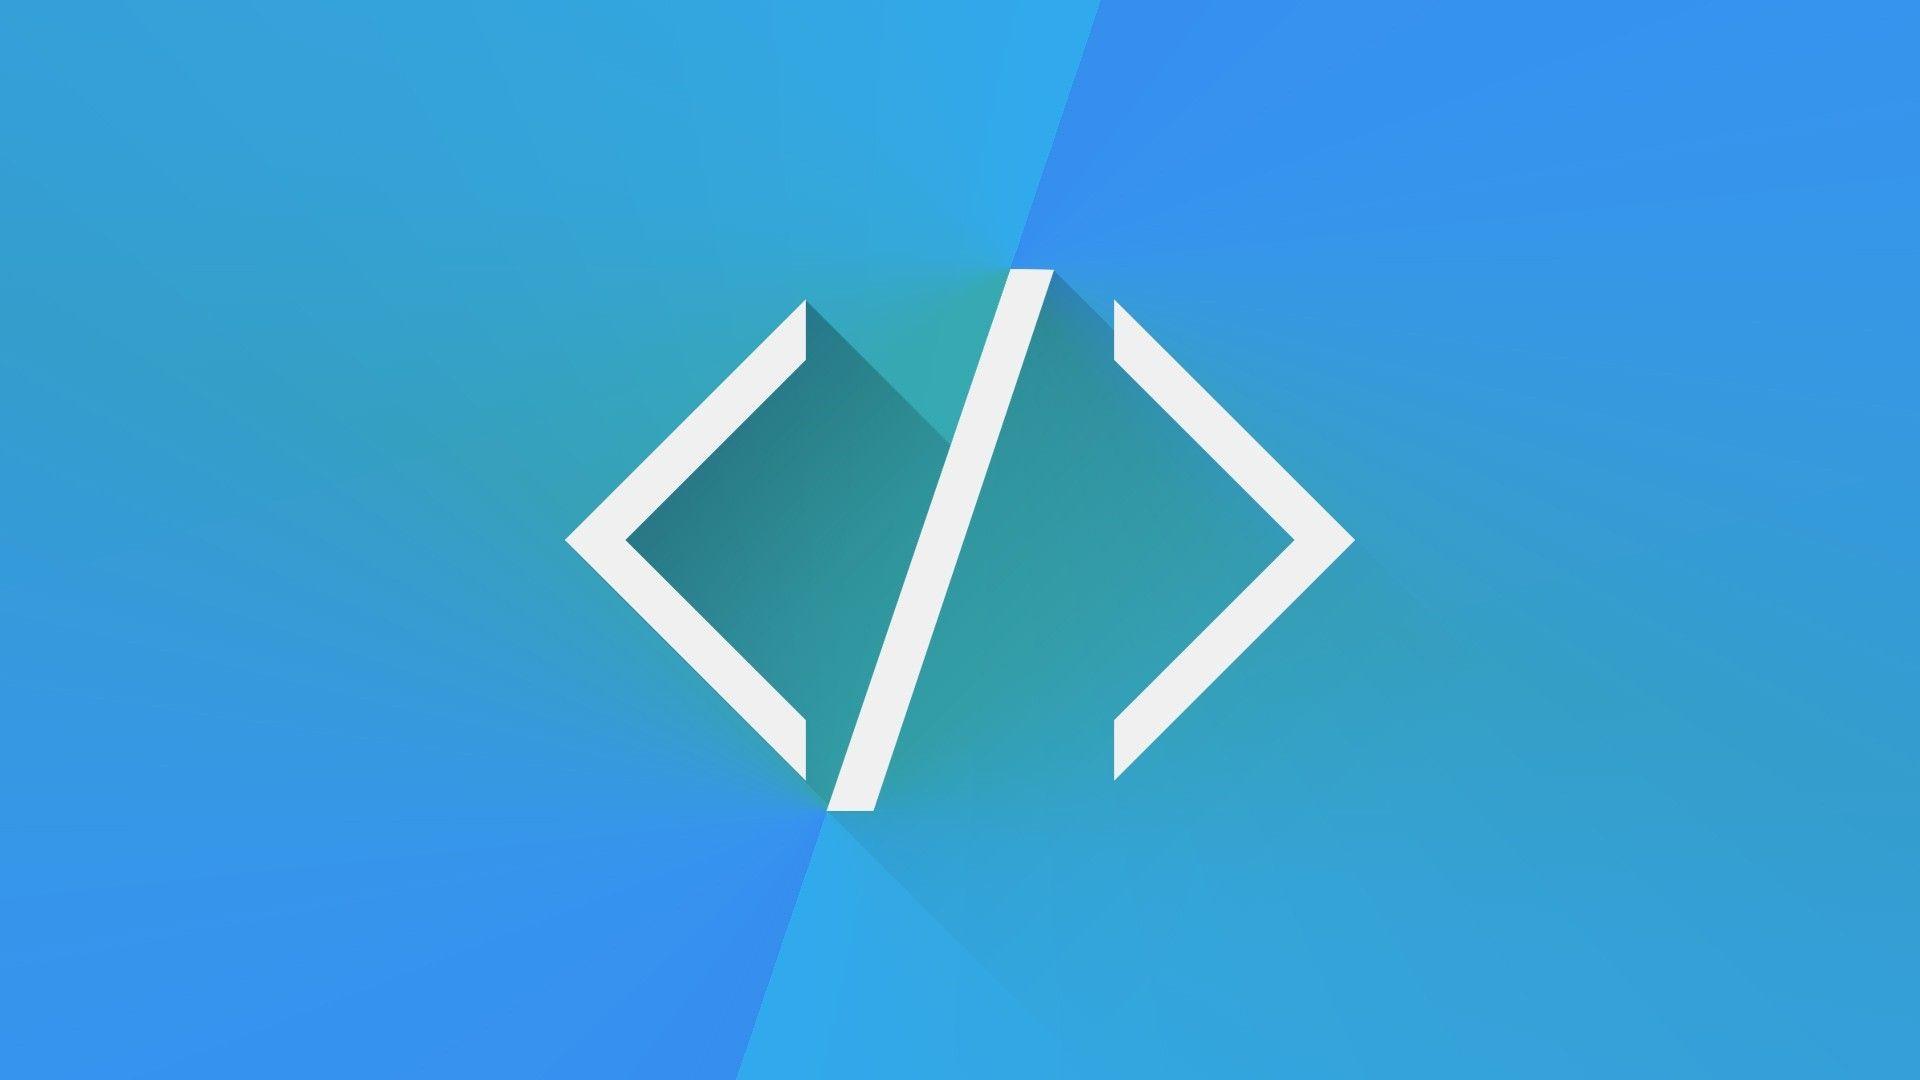 Coding wallpaper for laptop